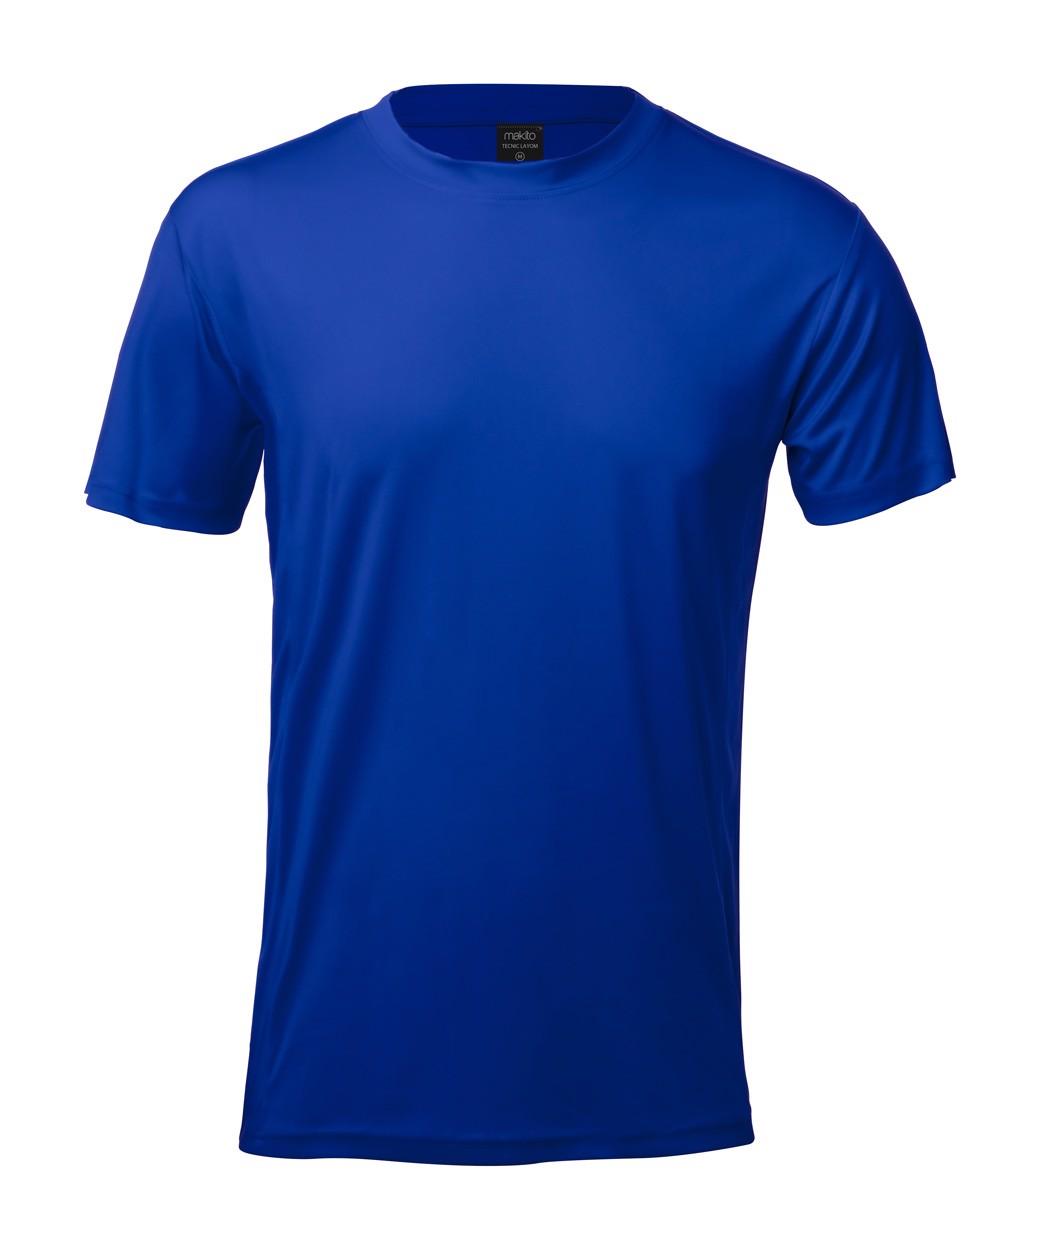 Sportovní Tričko Tecnic Layom - Modrá / XXL